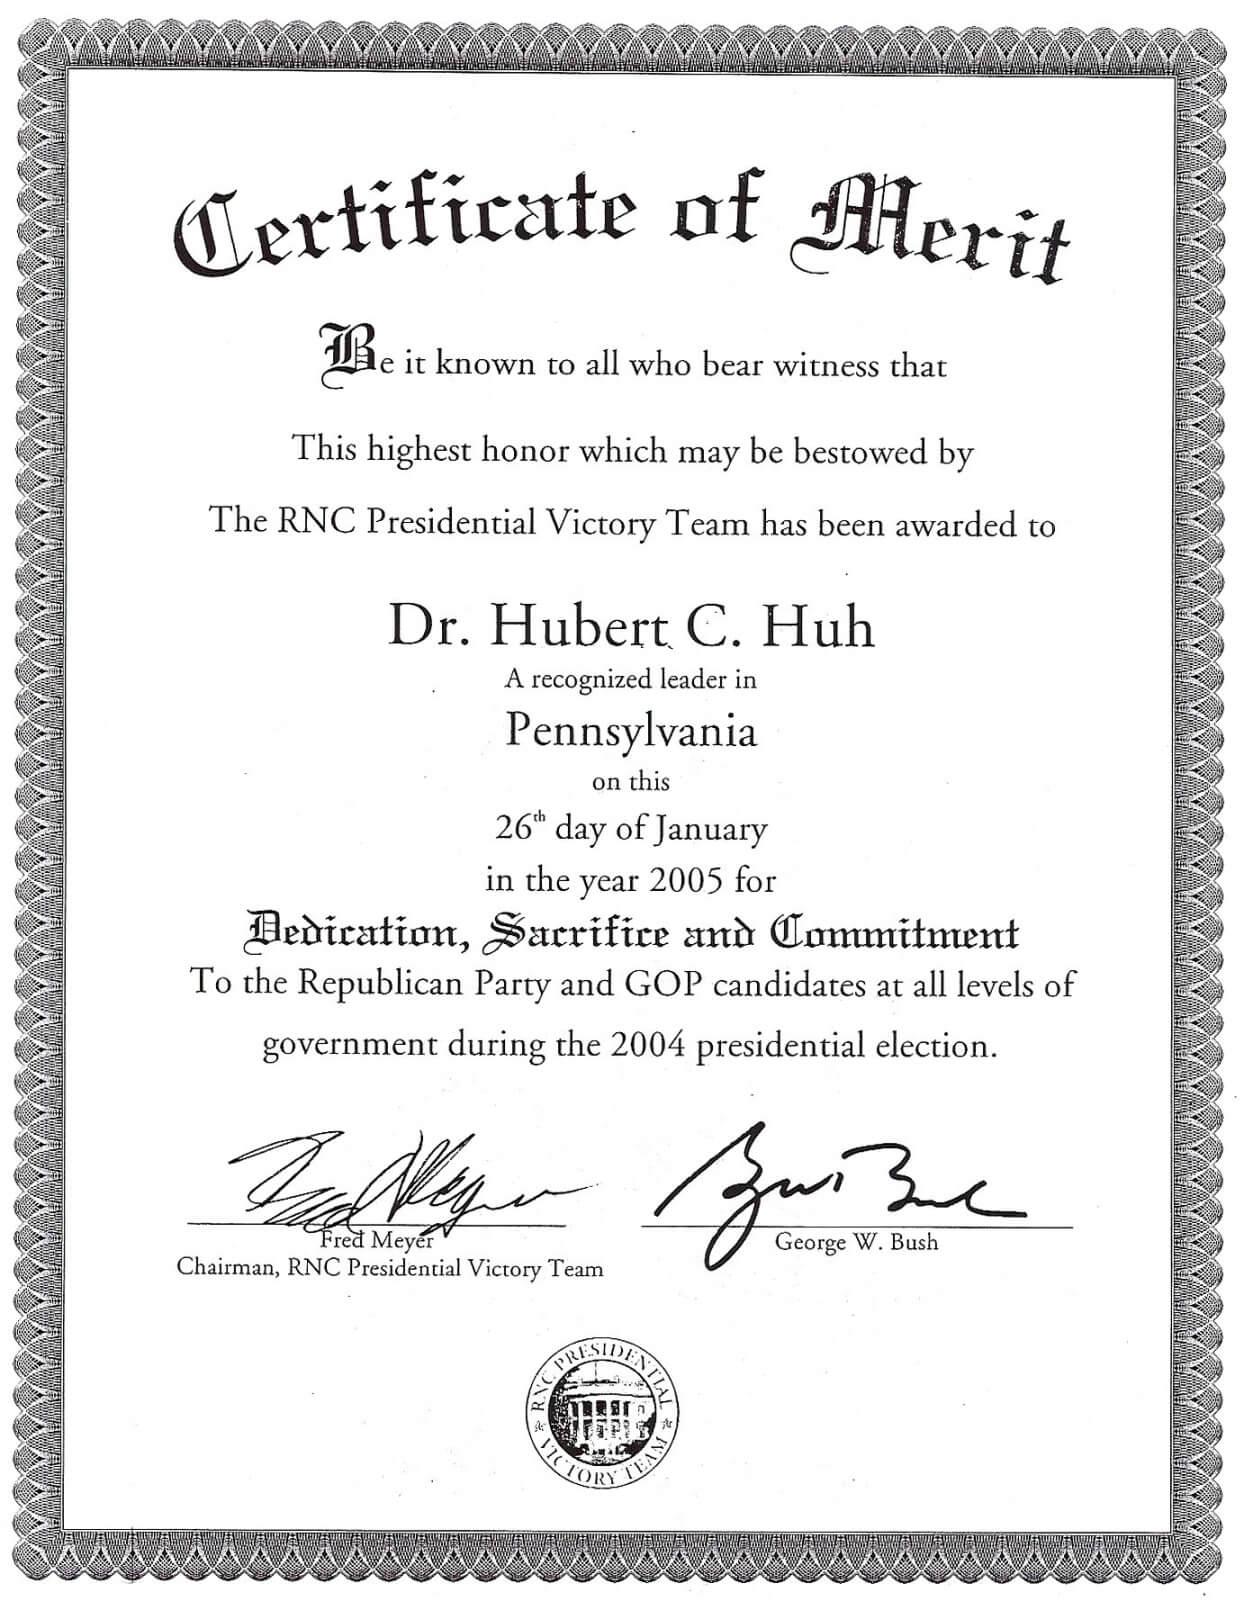 Sales Award Certificate For Sales Certificate Template